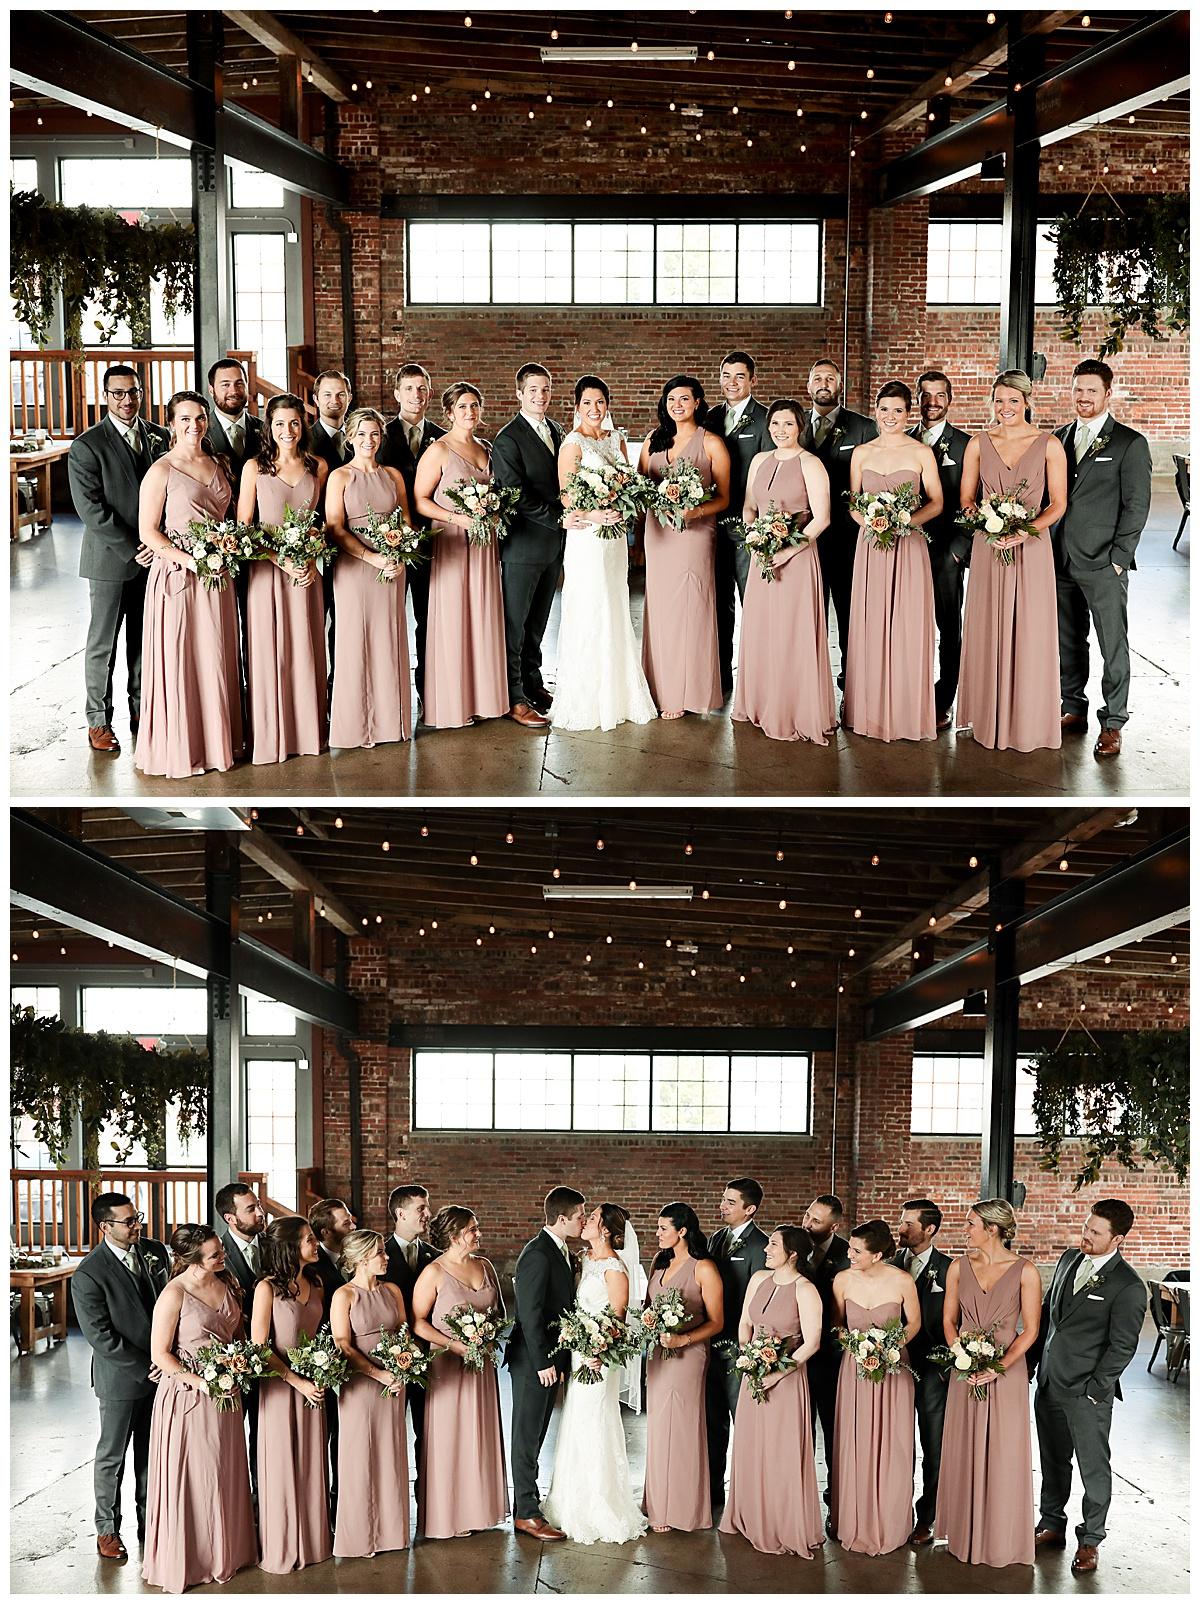 INDUSTRY_Indianapolis_Meghan Harrison Wedding Photography_0017.jpg